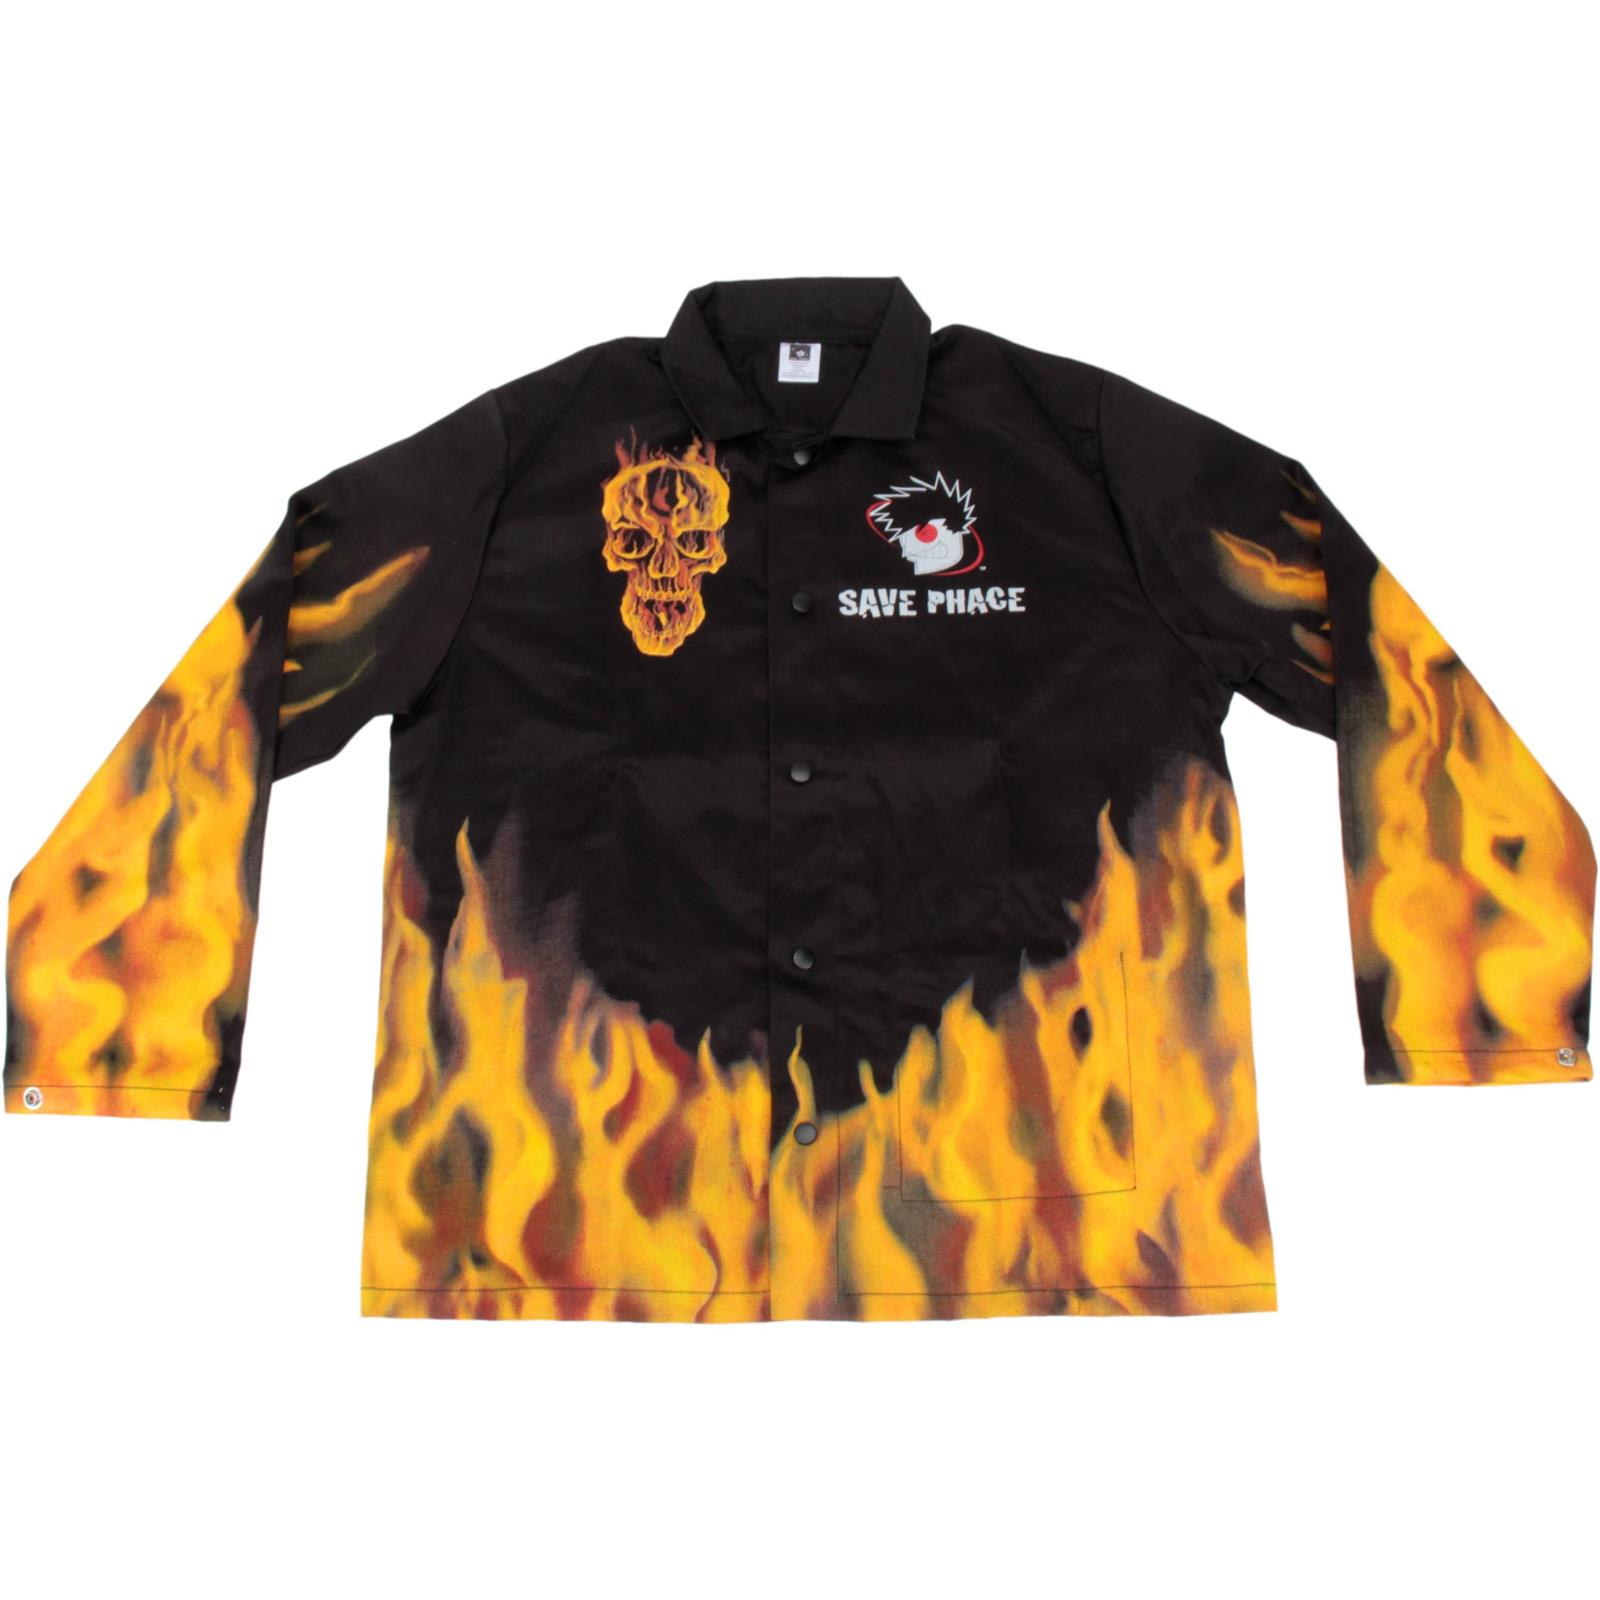 Save Phace Flame Welding Jacket, Large